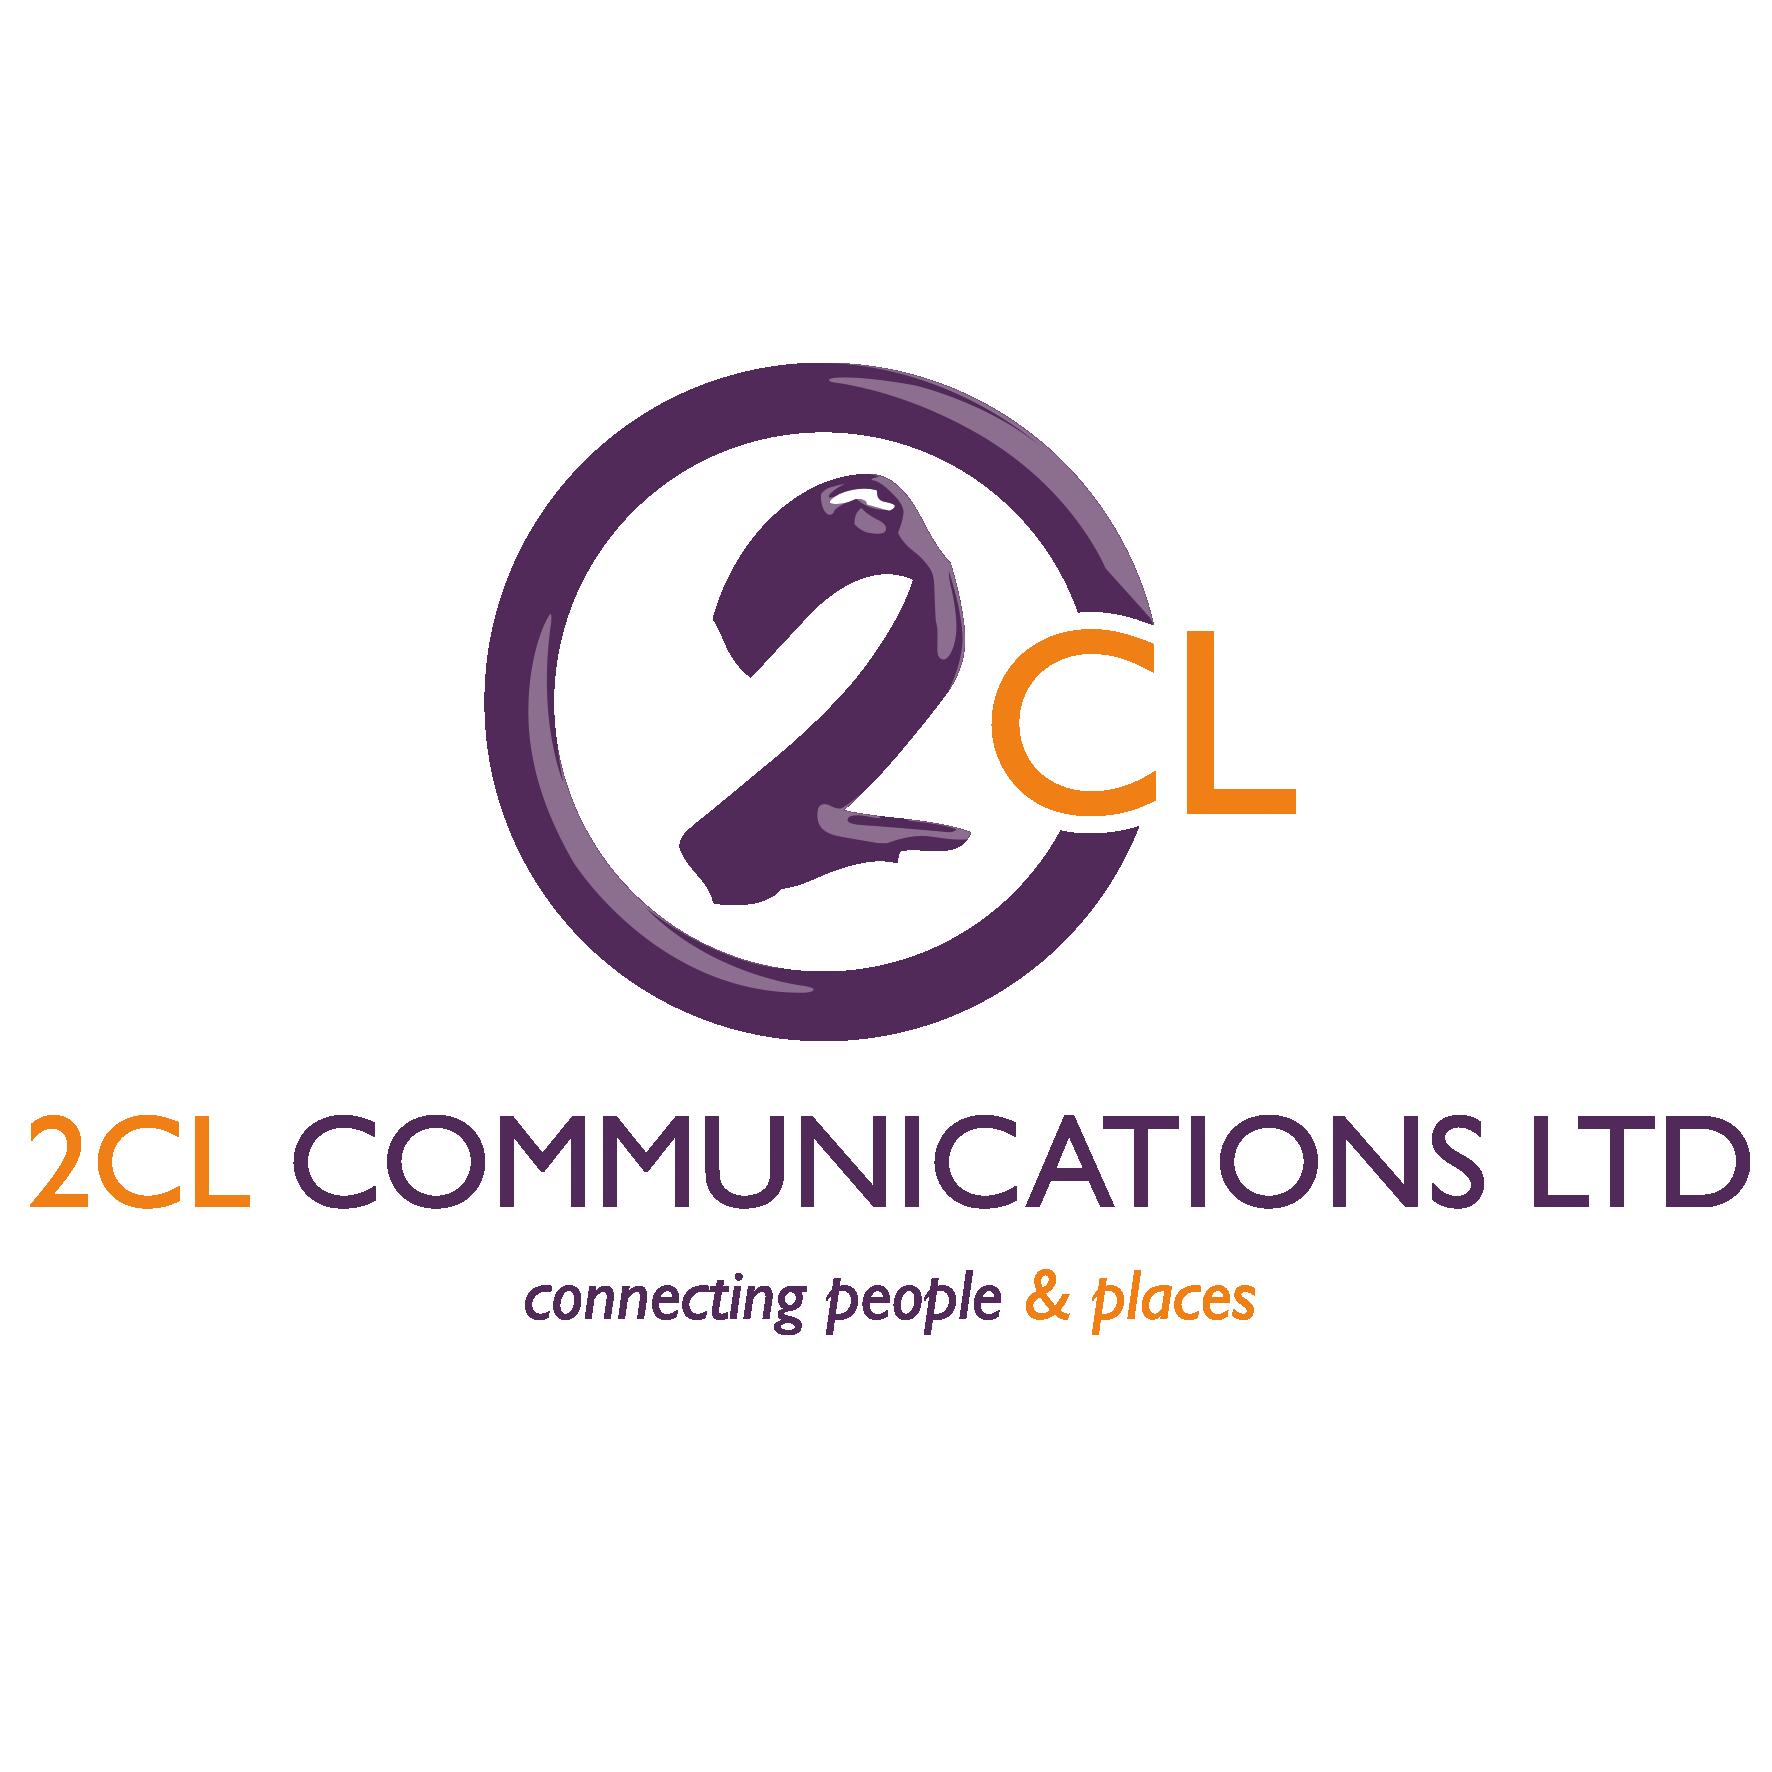 2CL Communications Ltd